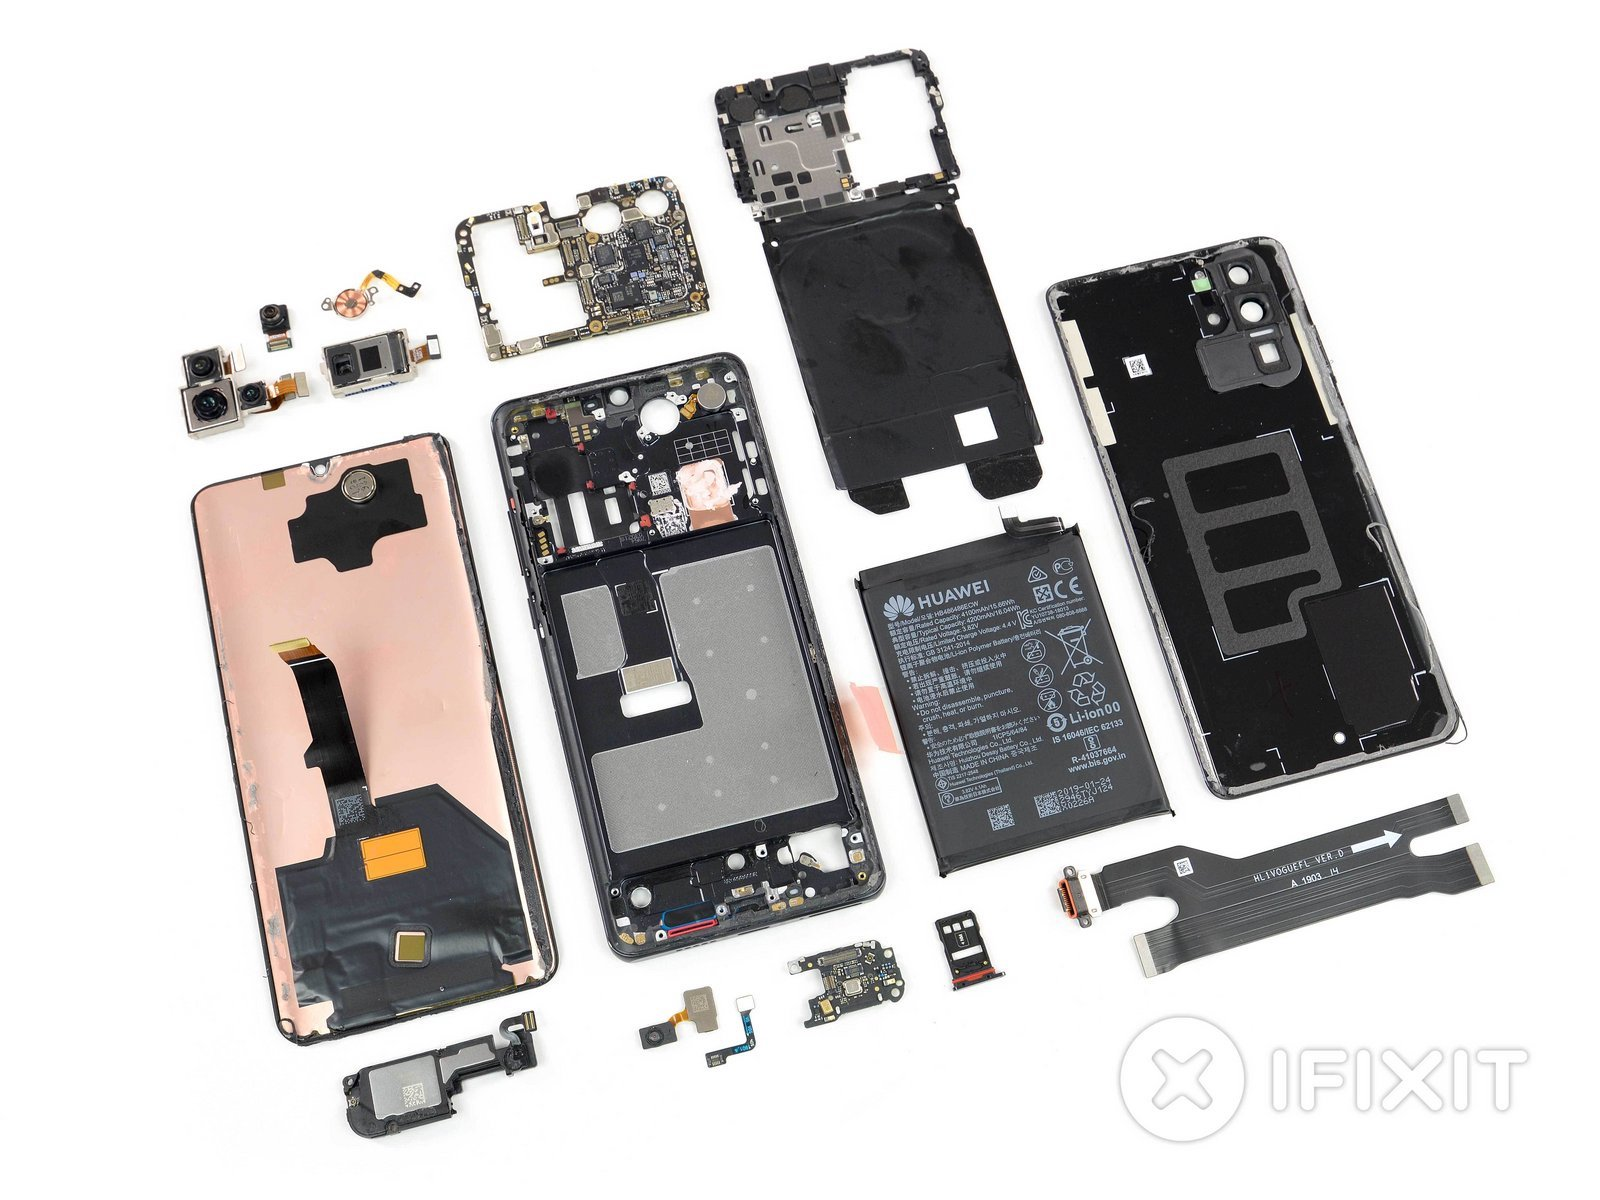 Huawei P30 ProをiFixitが分解報告。気になるカメラシステムの仕組みは ...